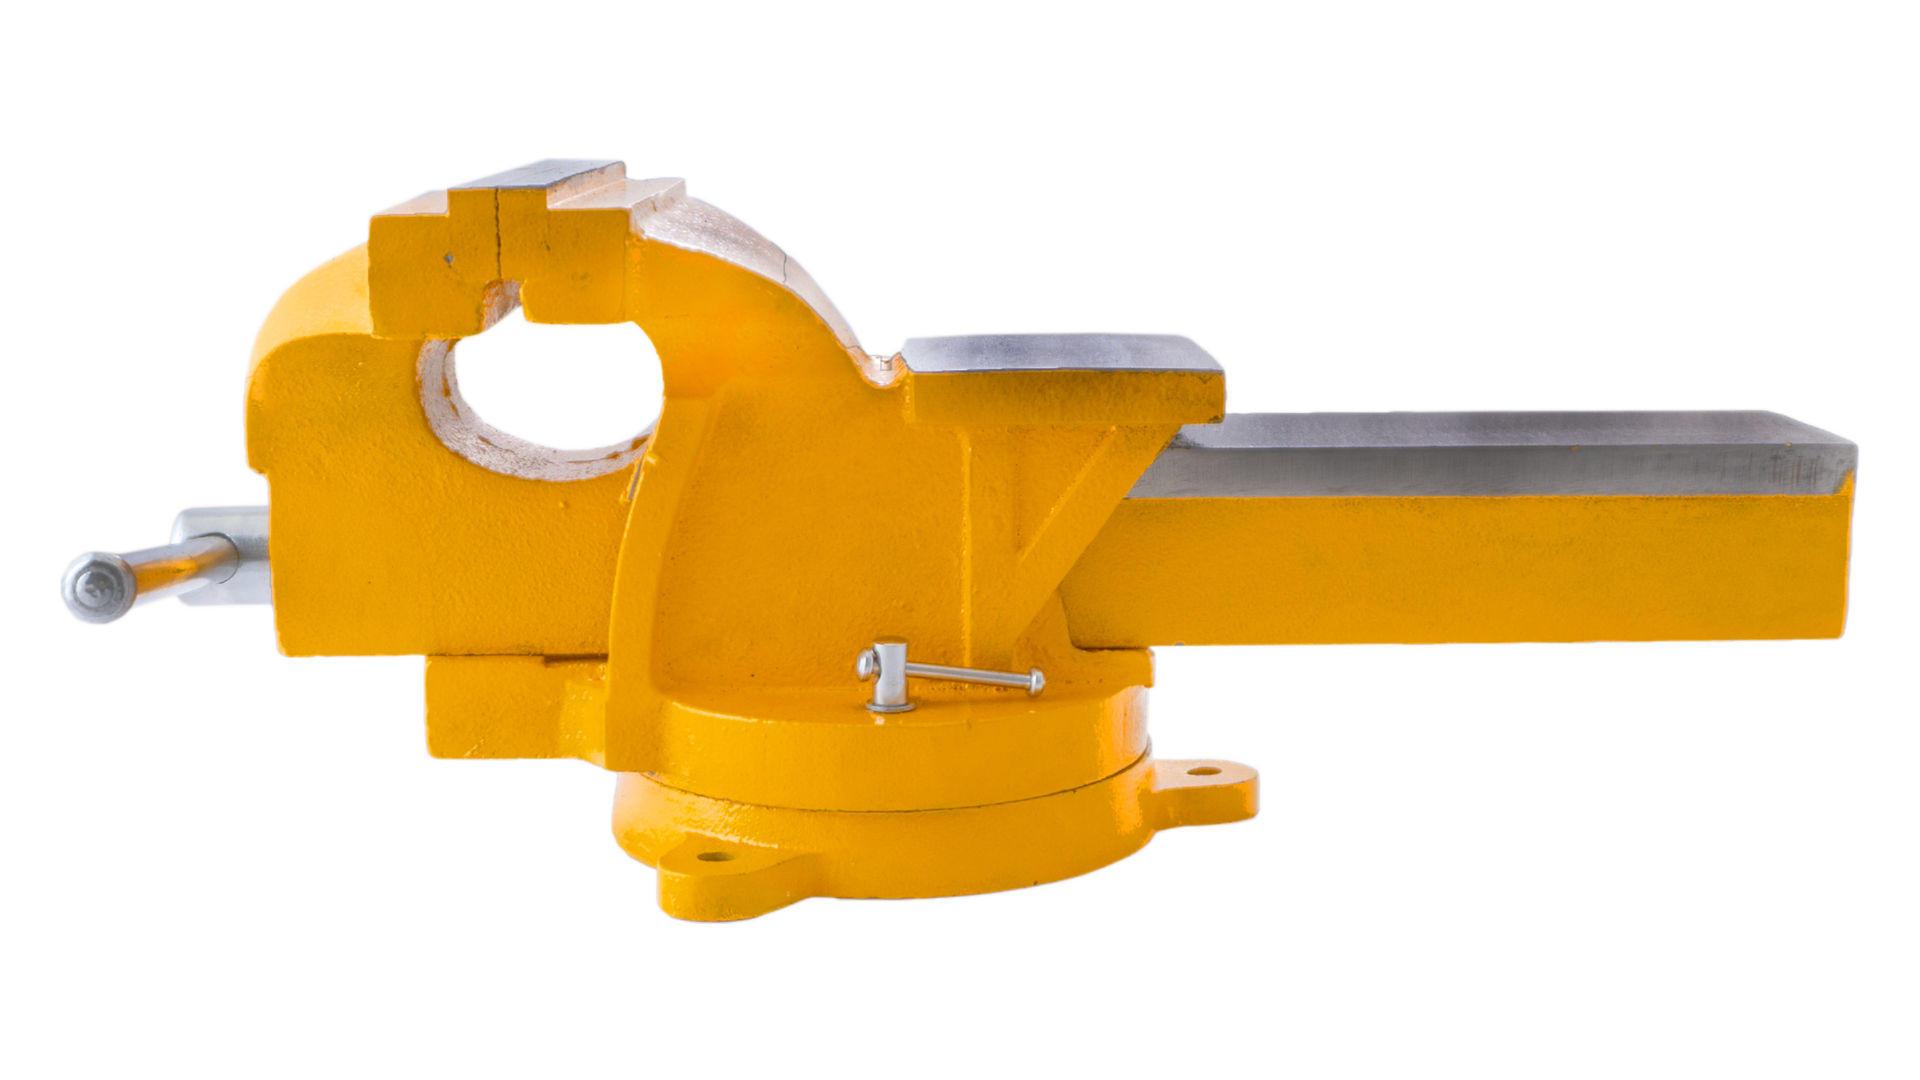 Тиски поворотные Mastertool - 200 мм 5